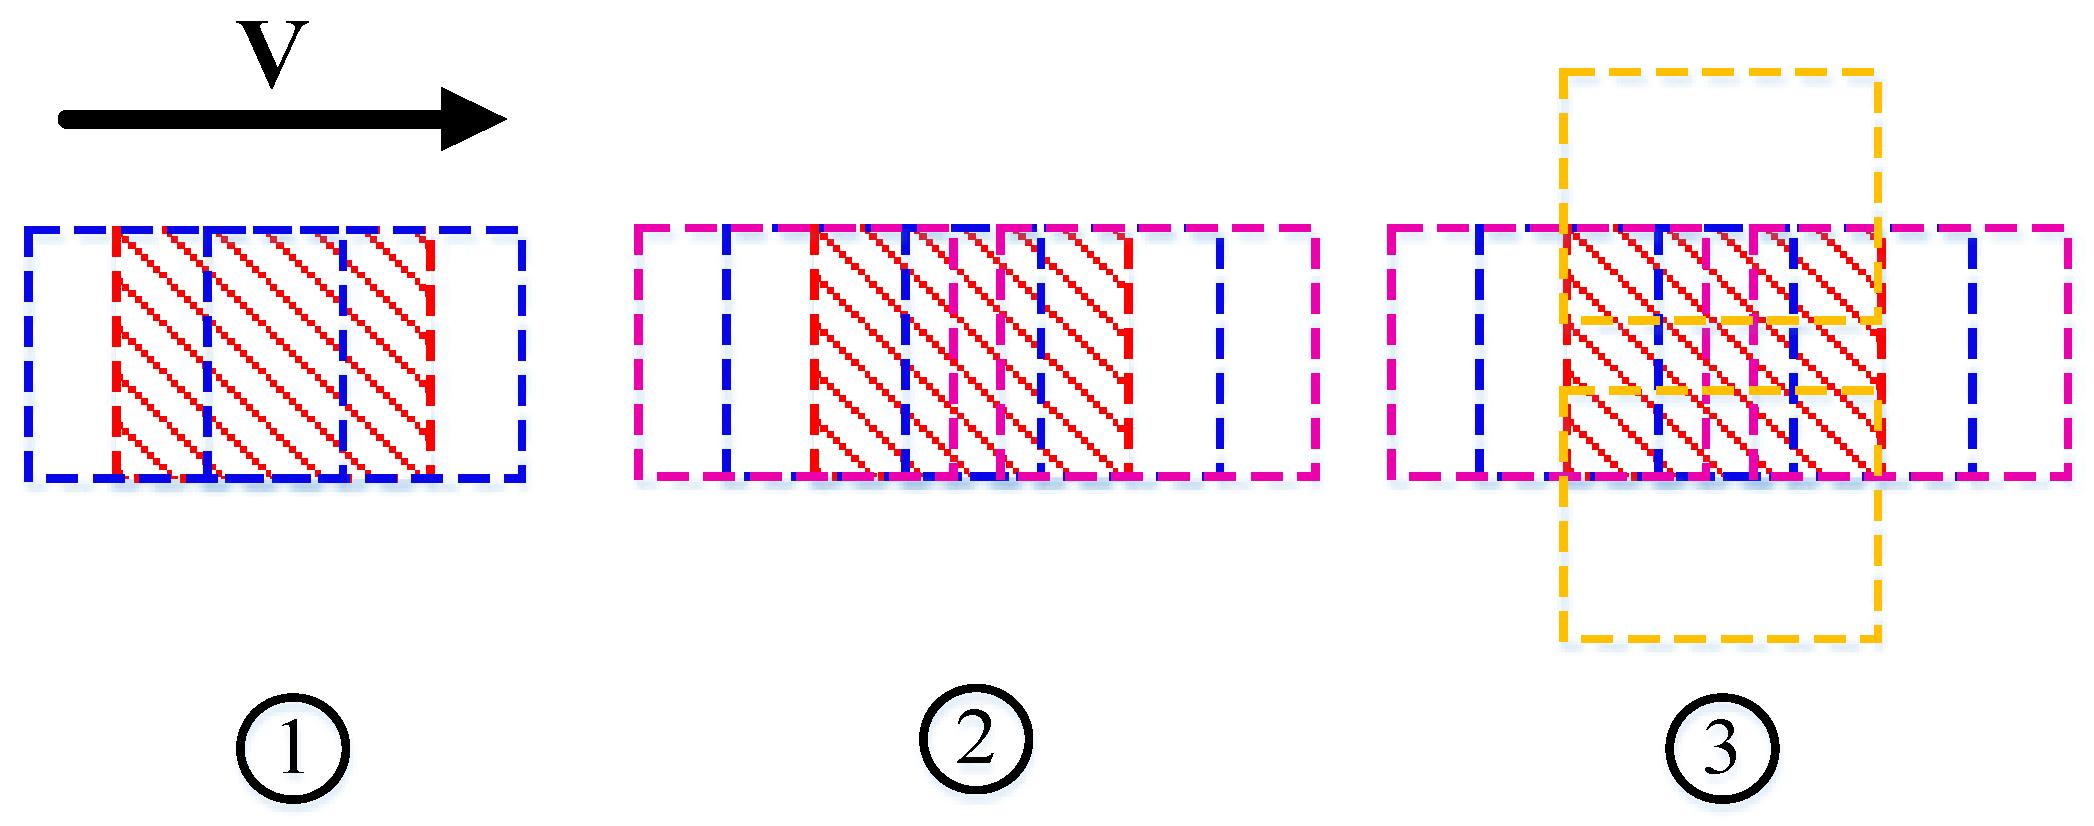 Remote Sensing | Free Full-Text | A Multi-View Dense Image